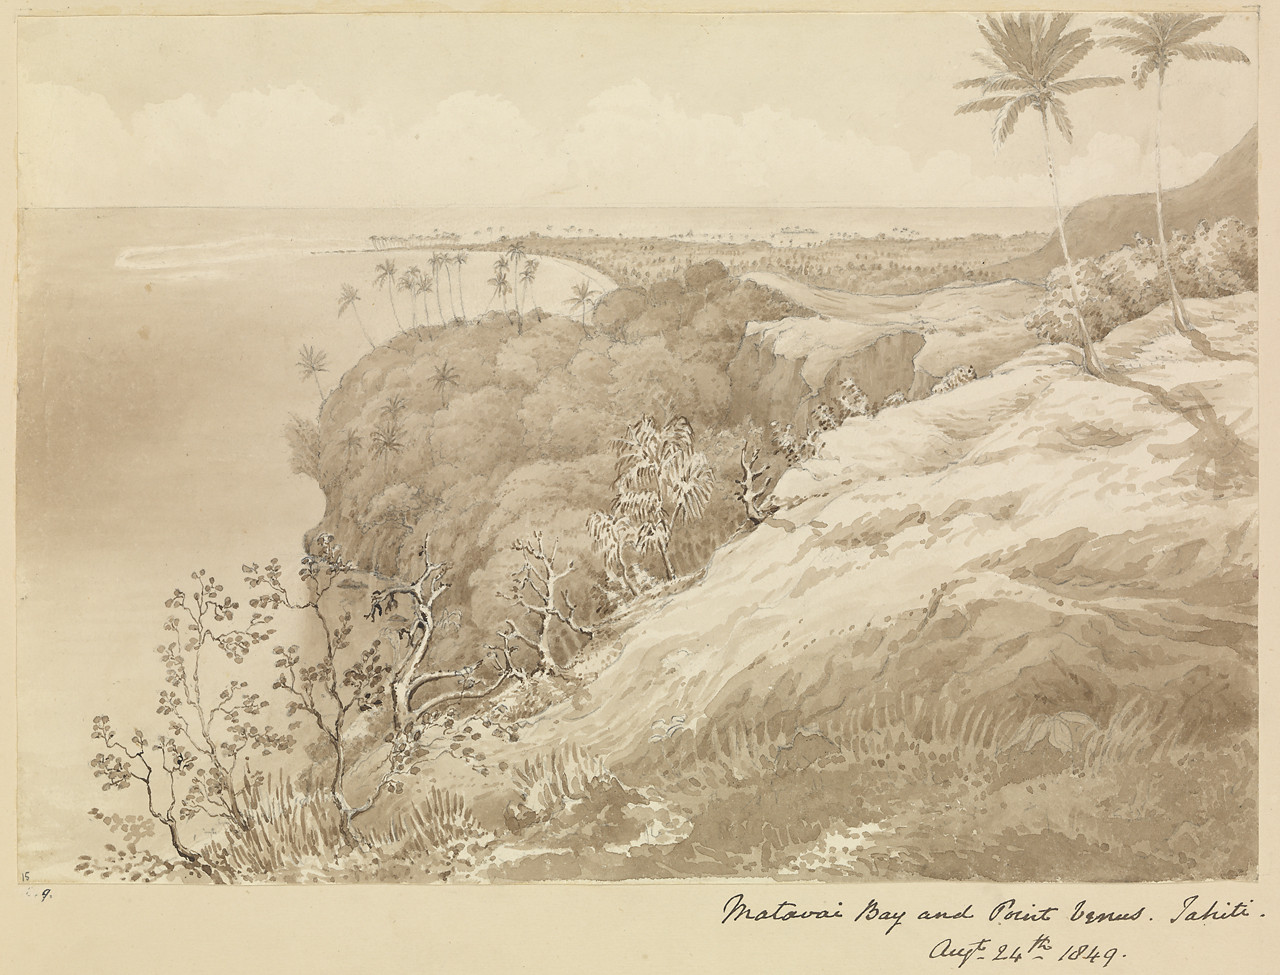 Edward_Gennys_Fanshawe,_Matavai_Bay_and_Point_Venus,_Tahiti,_Augt_24th_1849_(Society_Islands)